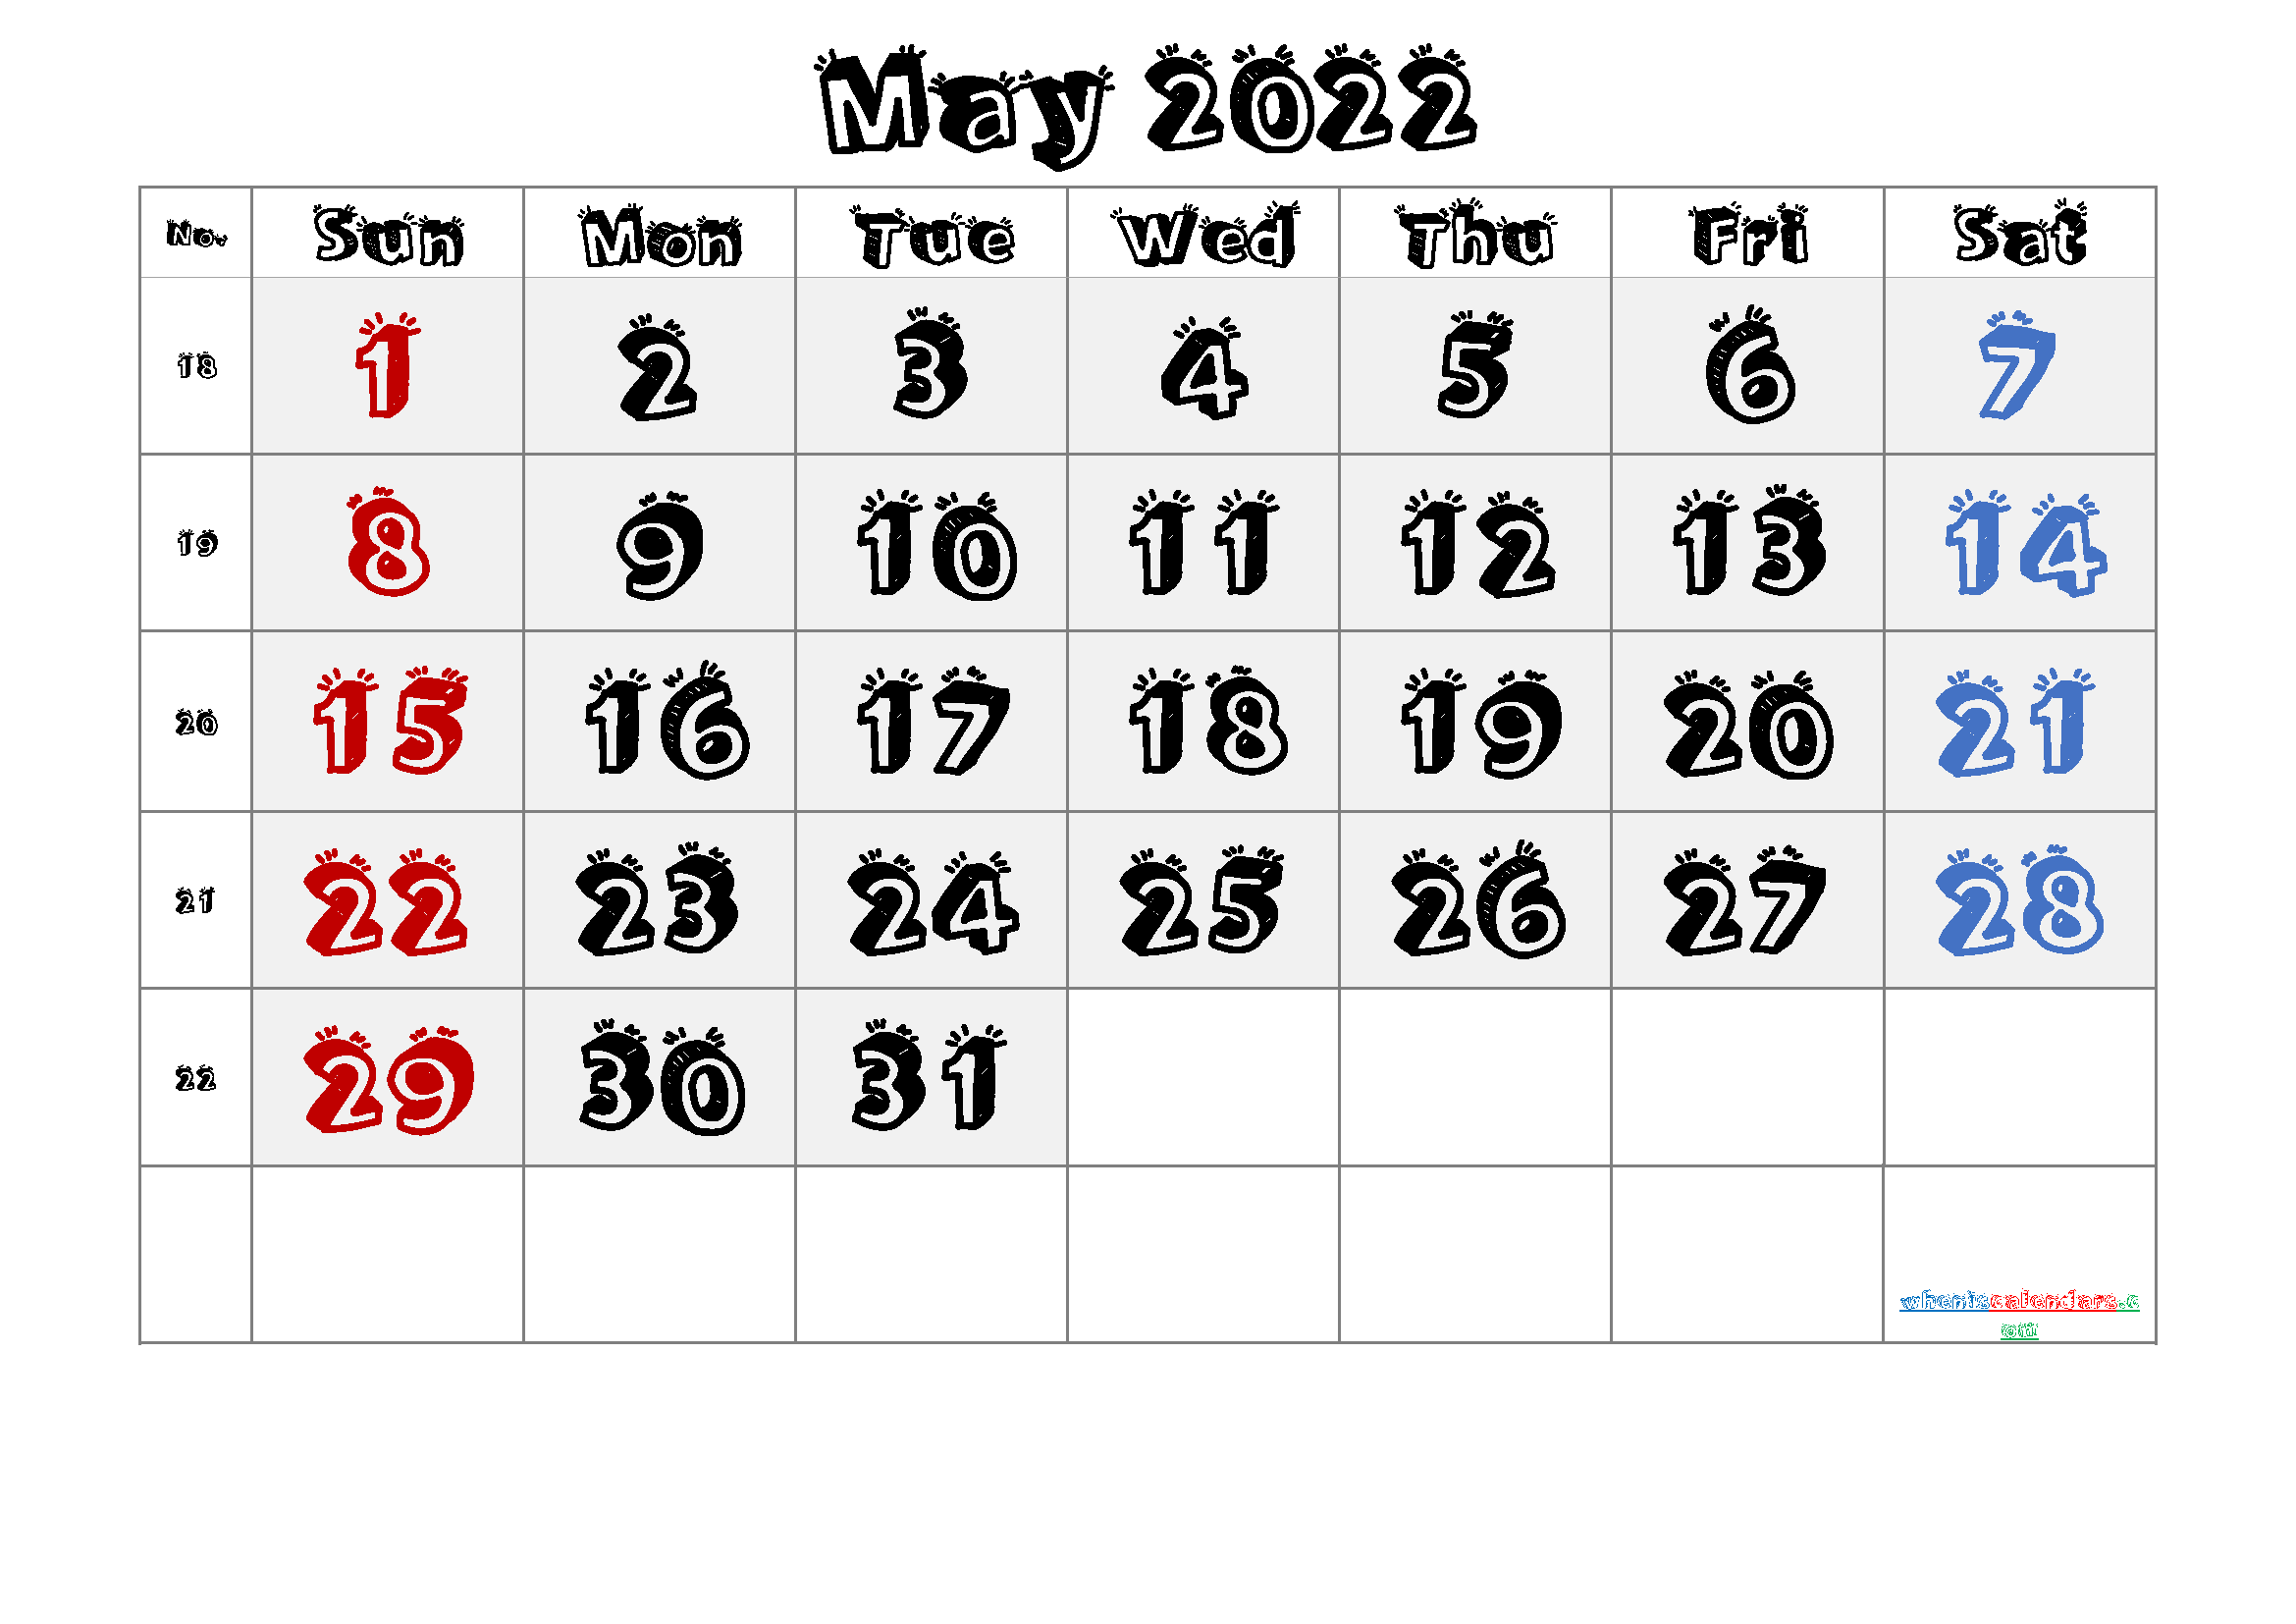 2022 May Free Printable Calendar